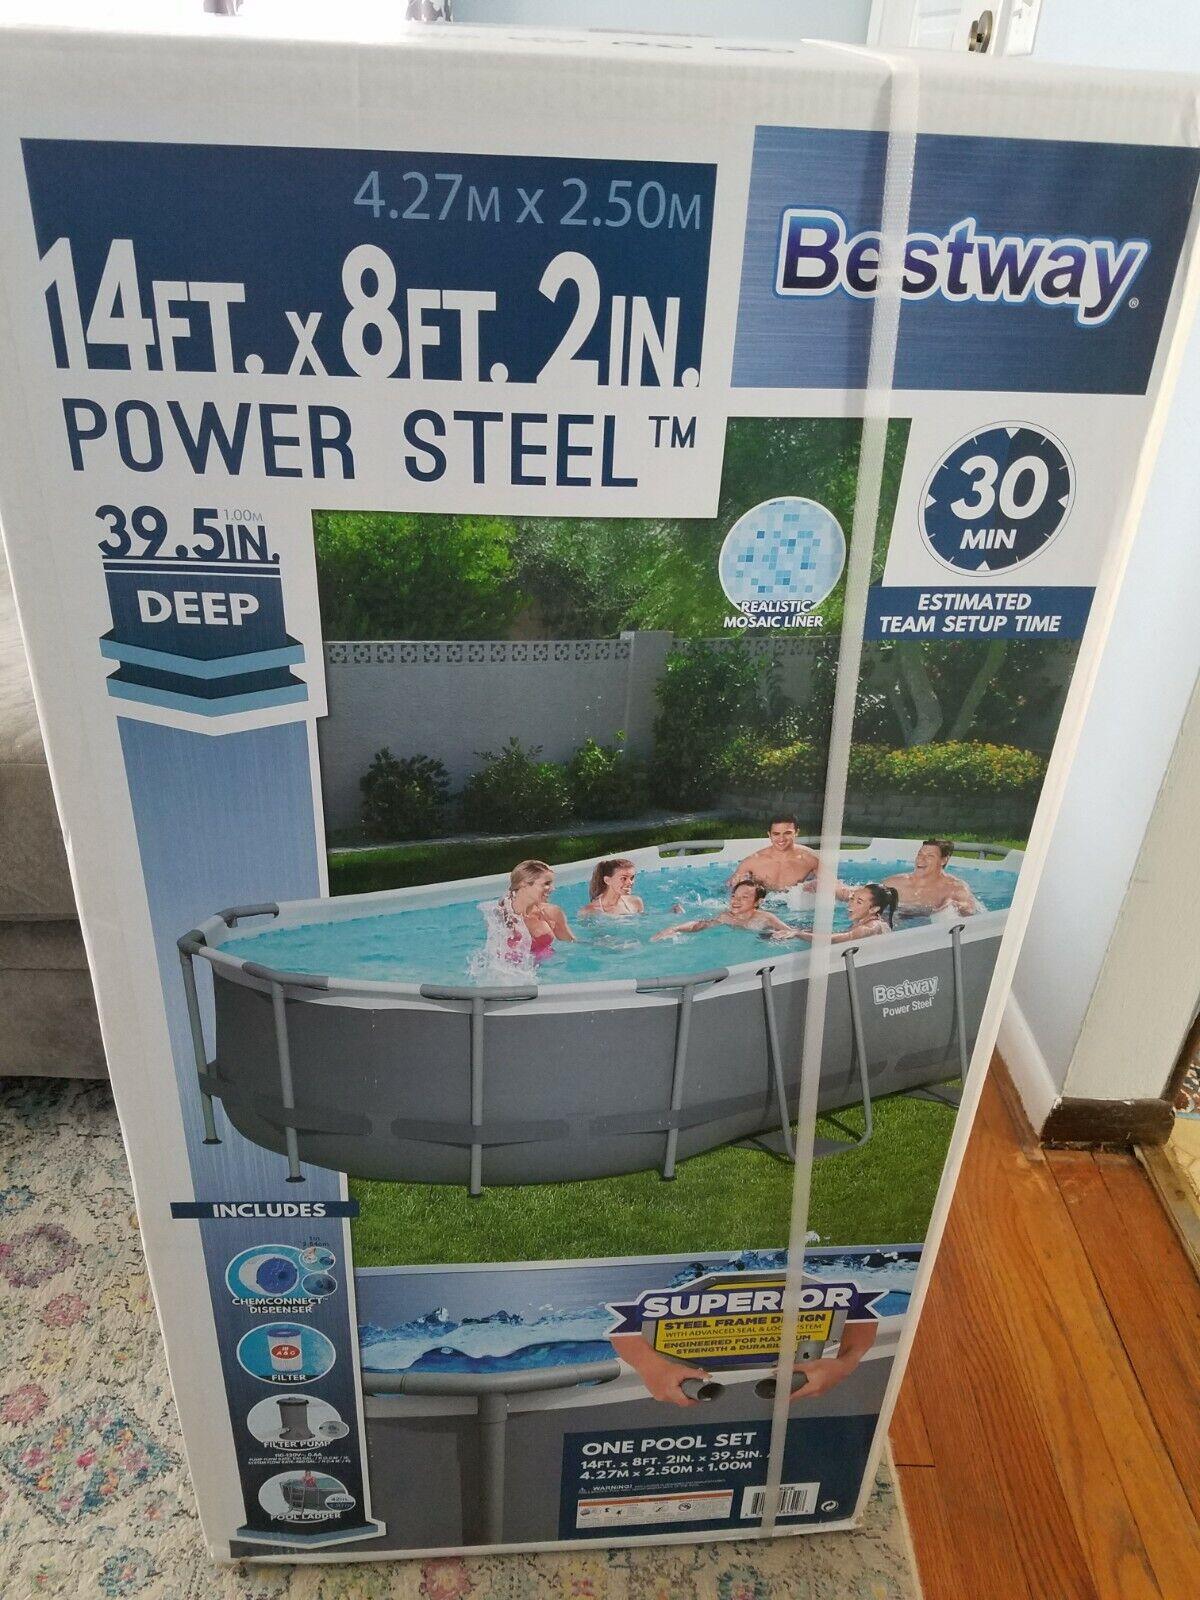 Bestway Power Steel Oval Frame Pool Set 13.91' X 8.2' X 39.5